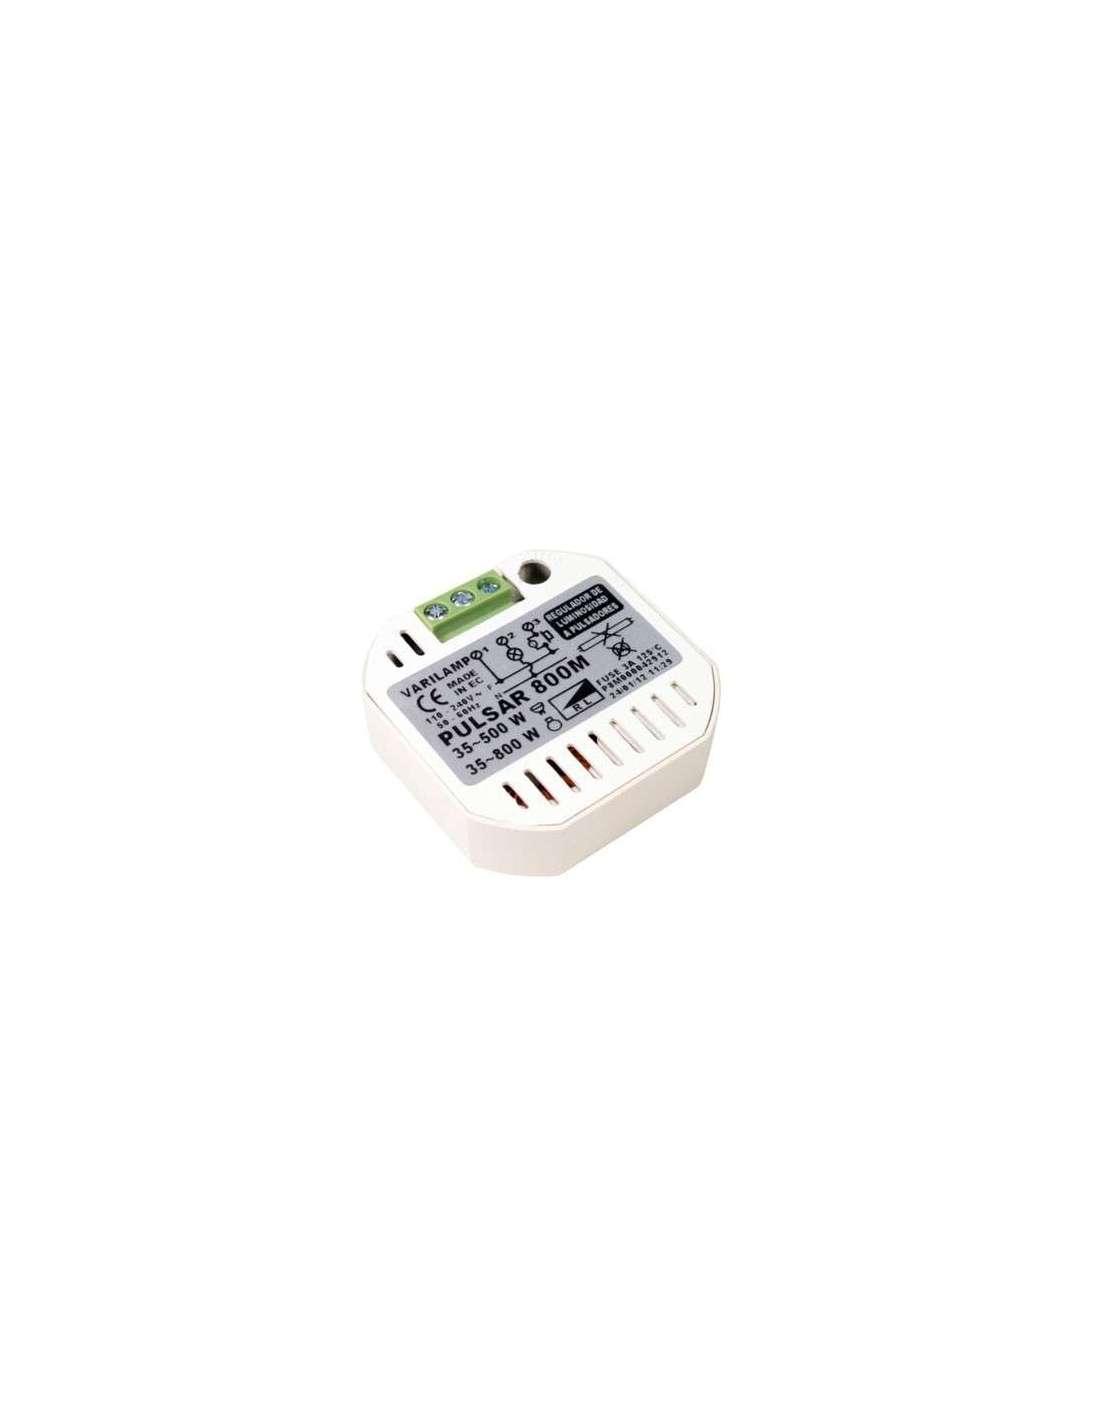 Regulador intensidad led finder pas regulador de luz for Regulador para led